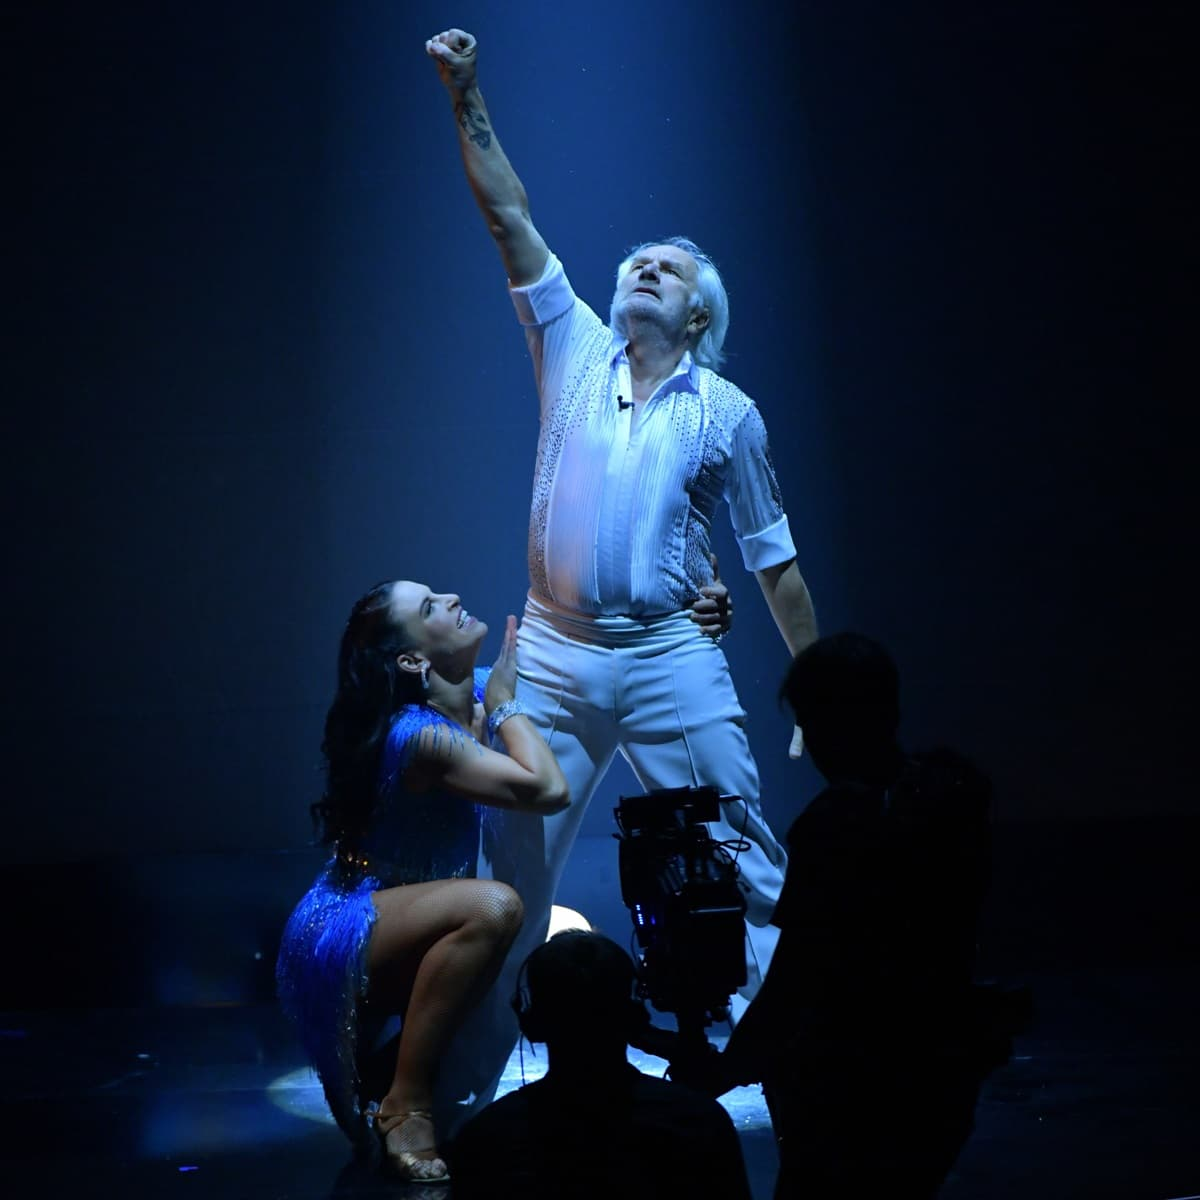 Michael Schottenberg - Conny Kreuter im Finale Dancing Stars am 10.5.2019